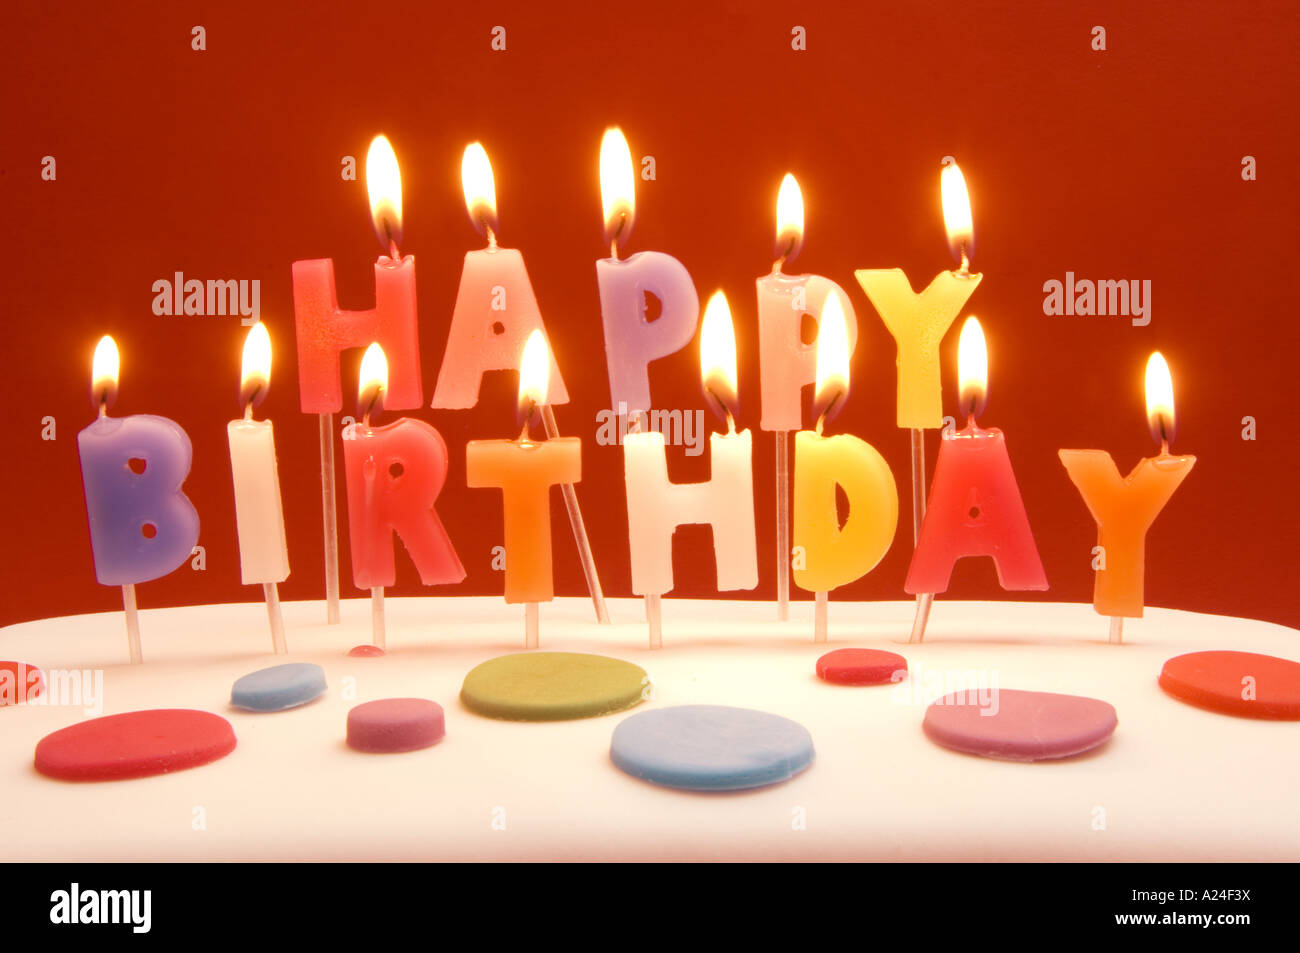 Happy Birthday Cake And Candles Stock Photo 10404061 Alamy